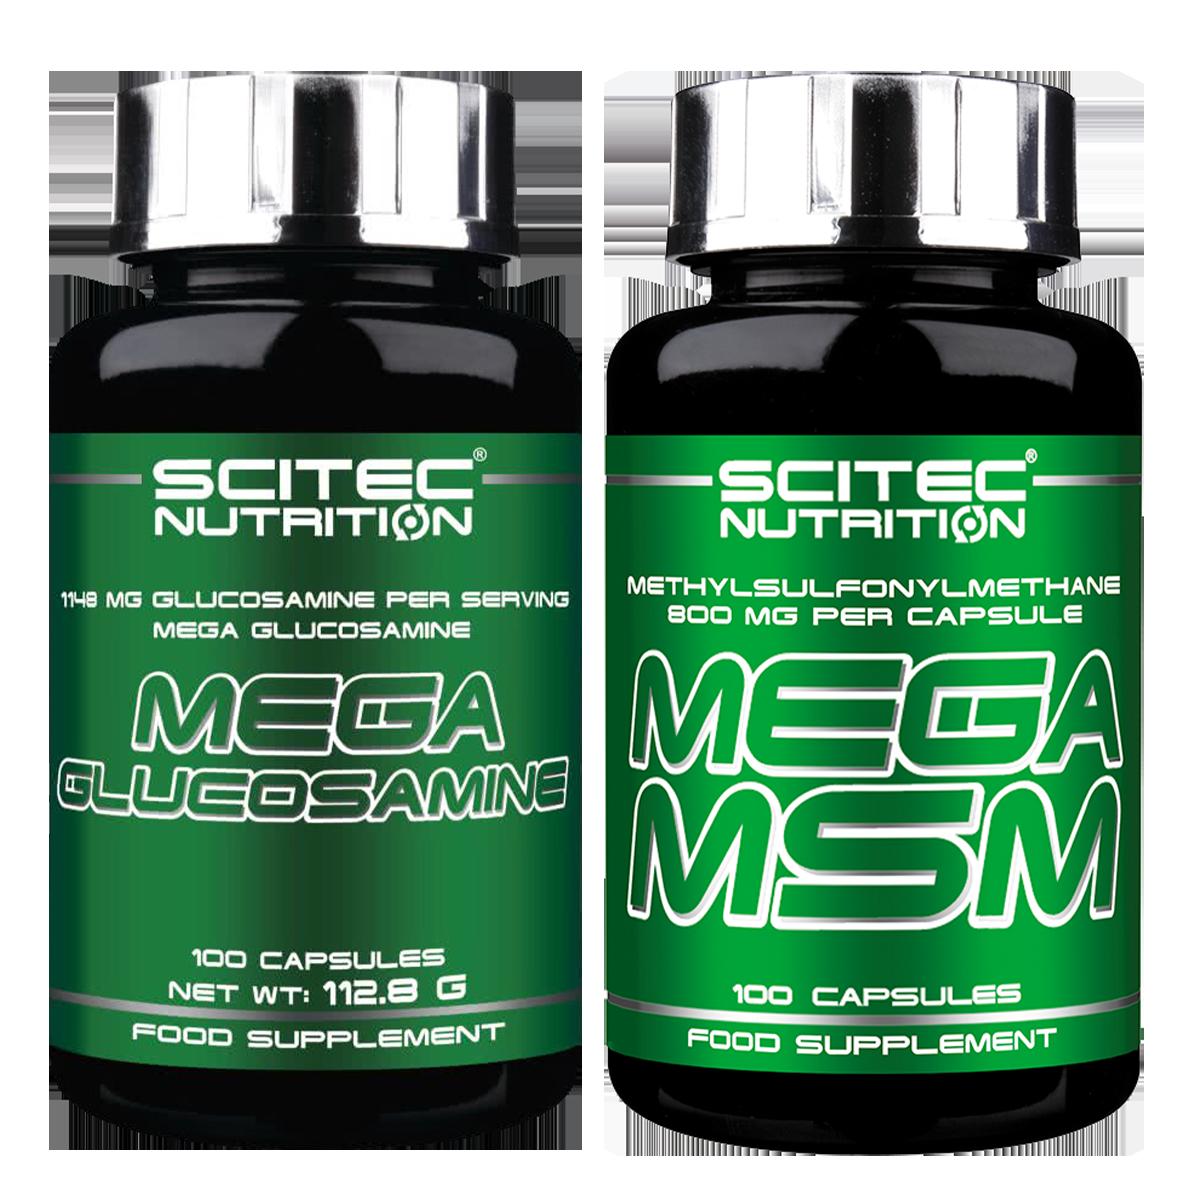 Scitec Nutrition Mega Glucosamine + Mega MSM szett